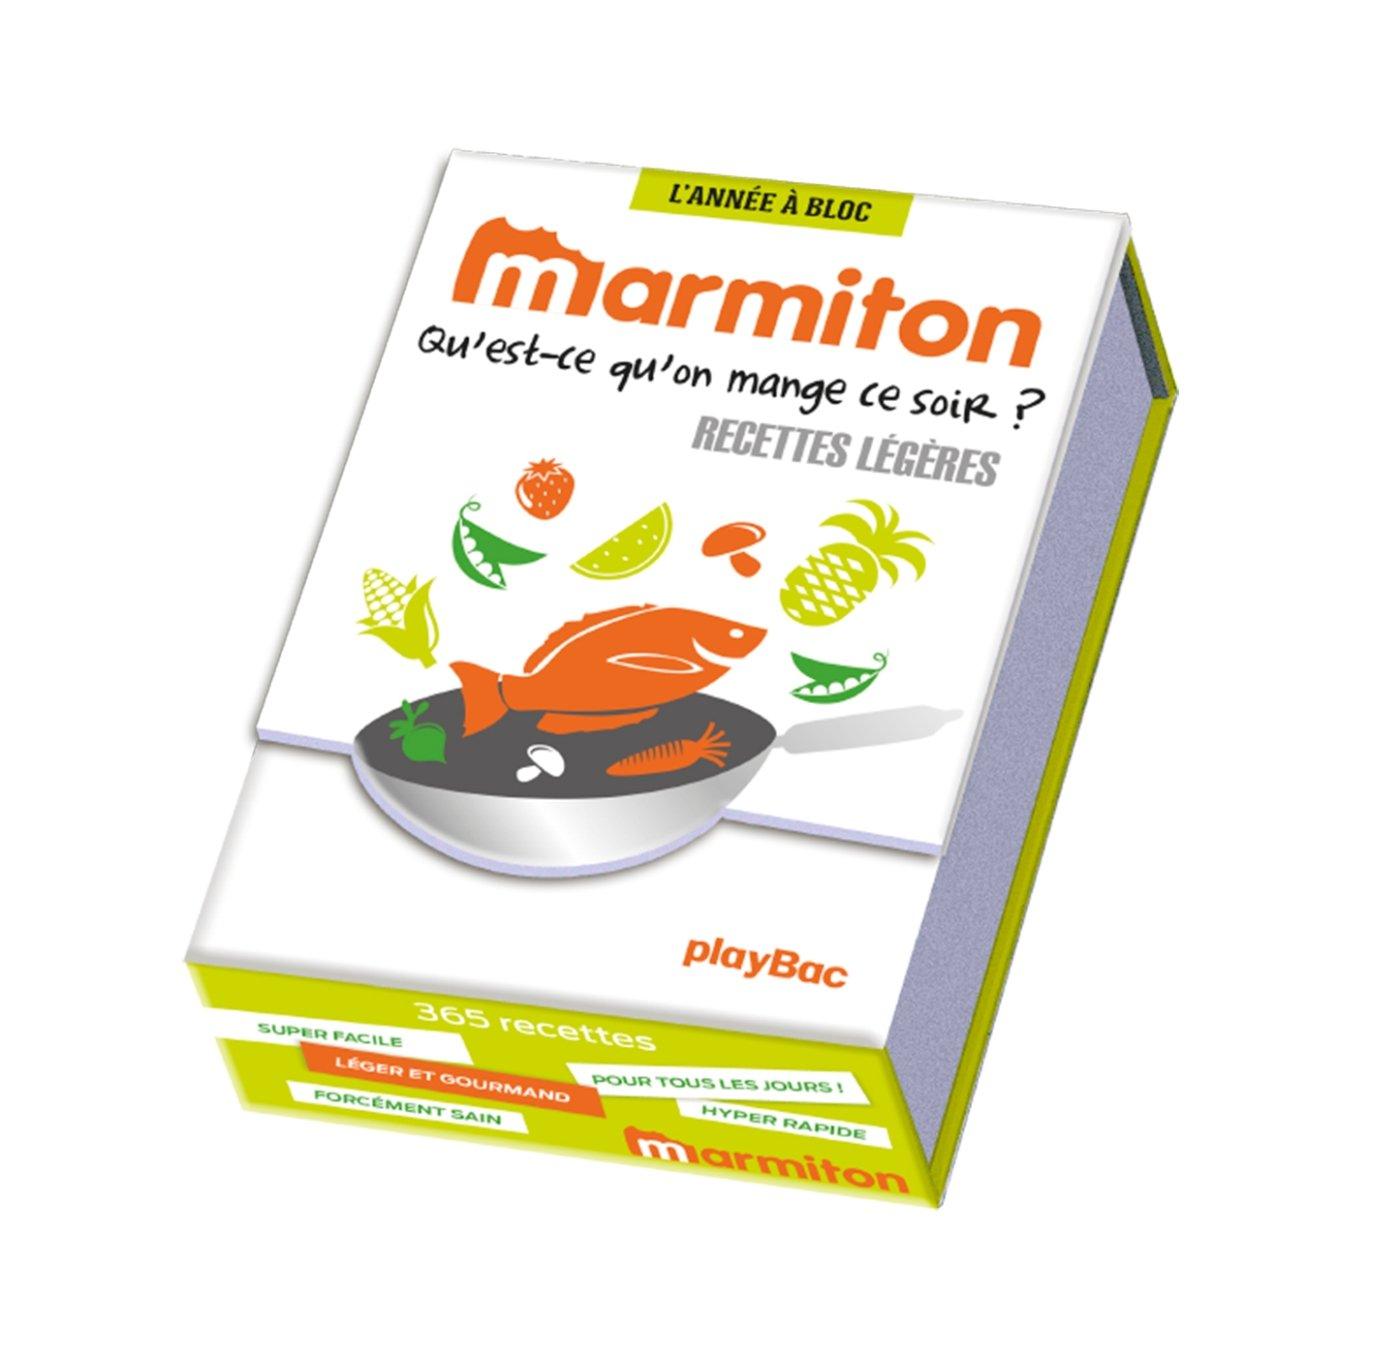 Amazon Fr Annee A Bloc 365 Recettes Legeres Marmiton Marmiton